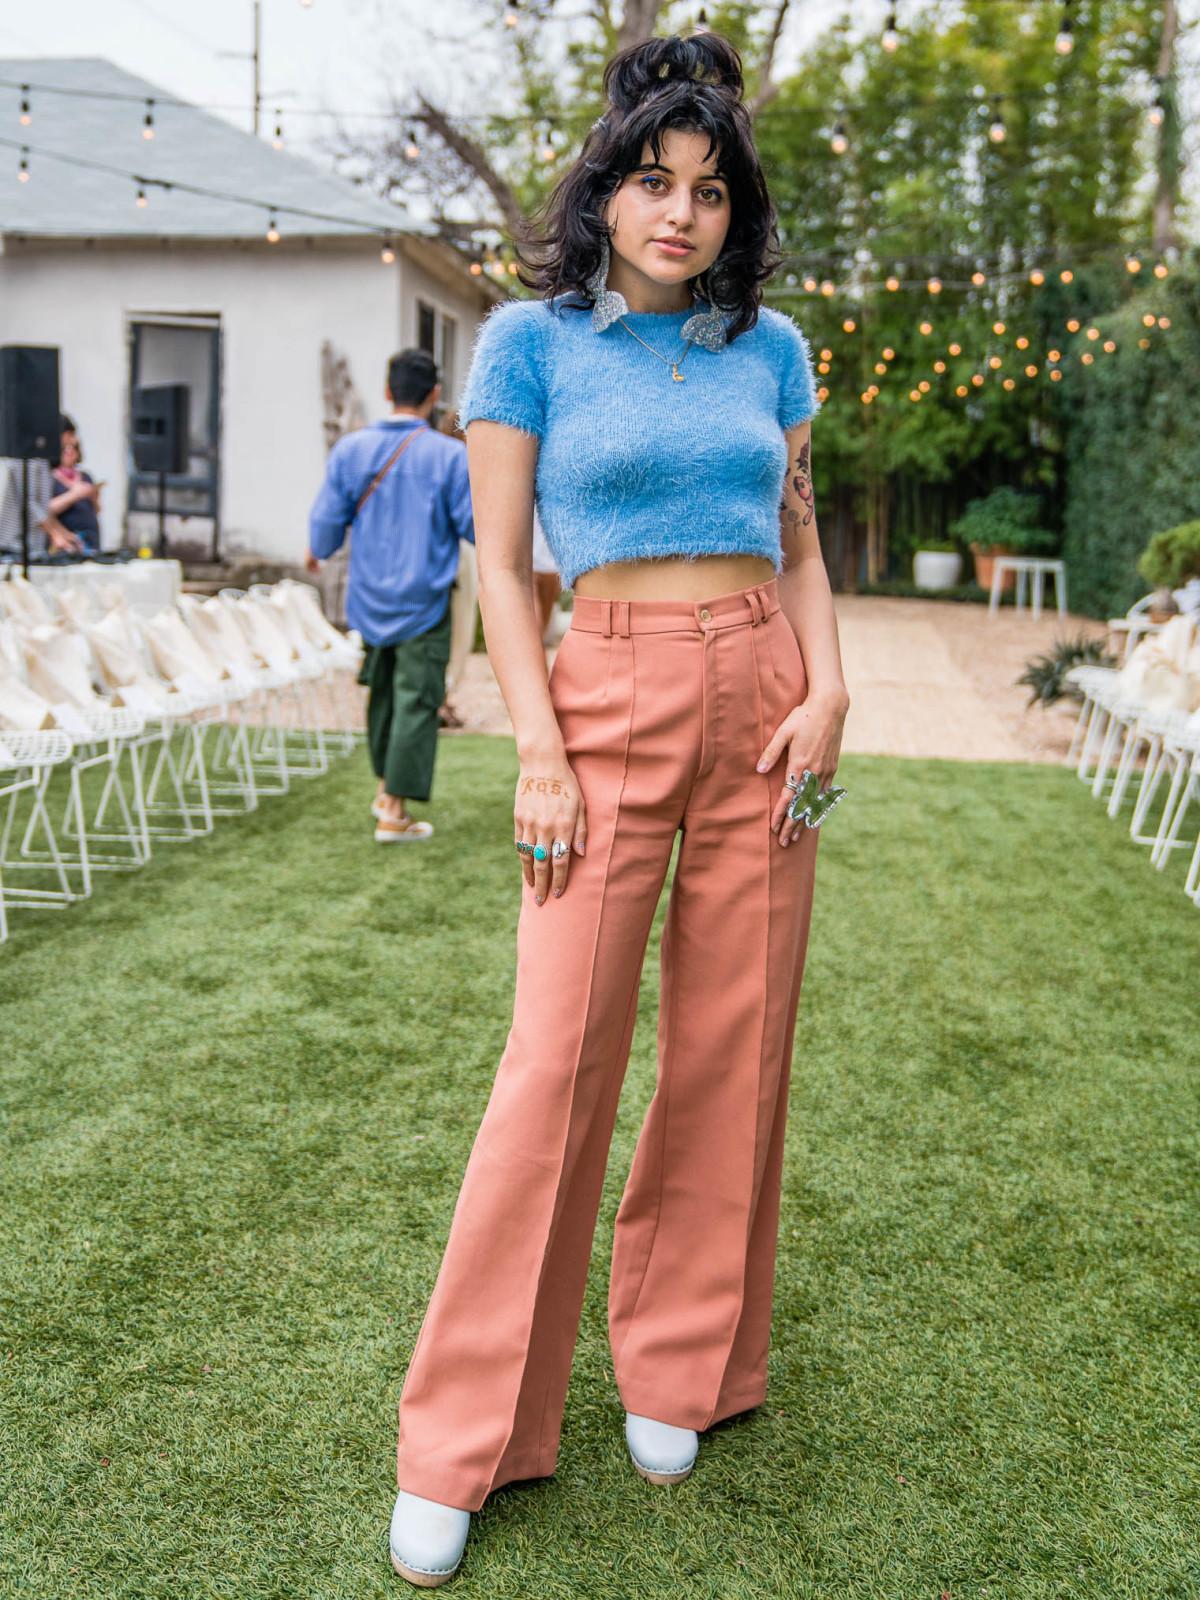 SXSW Street Style 2019 Brittany Keen